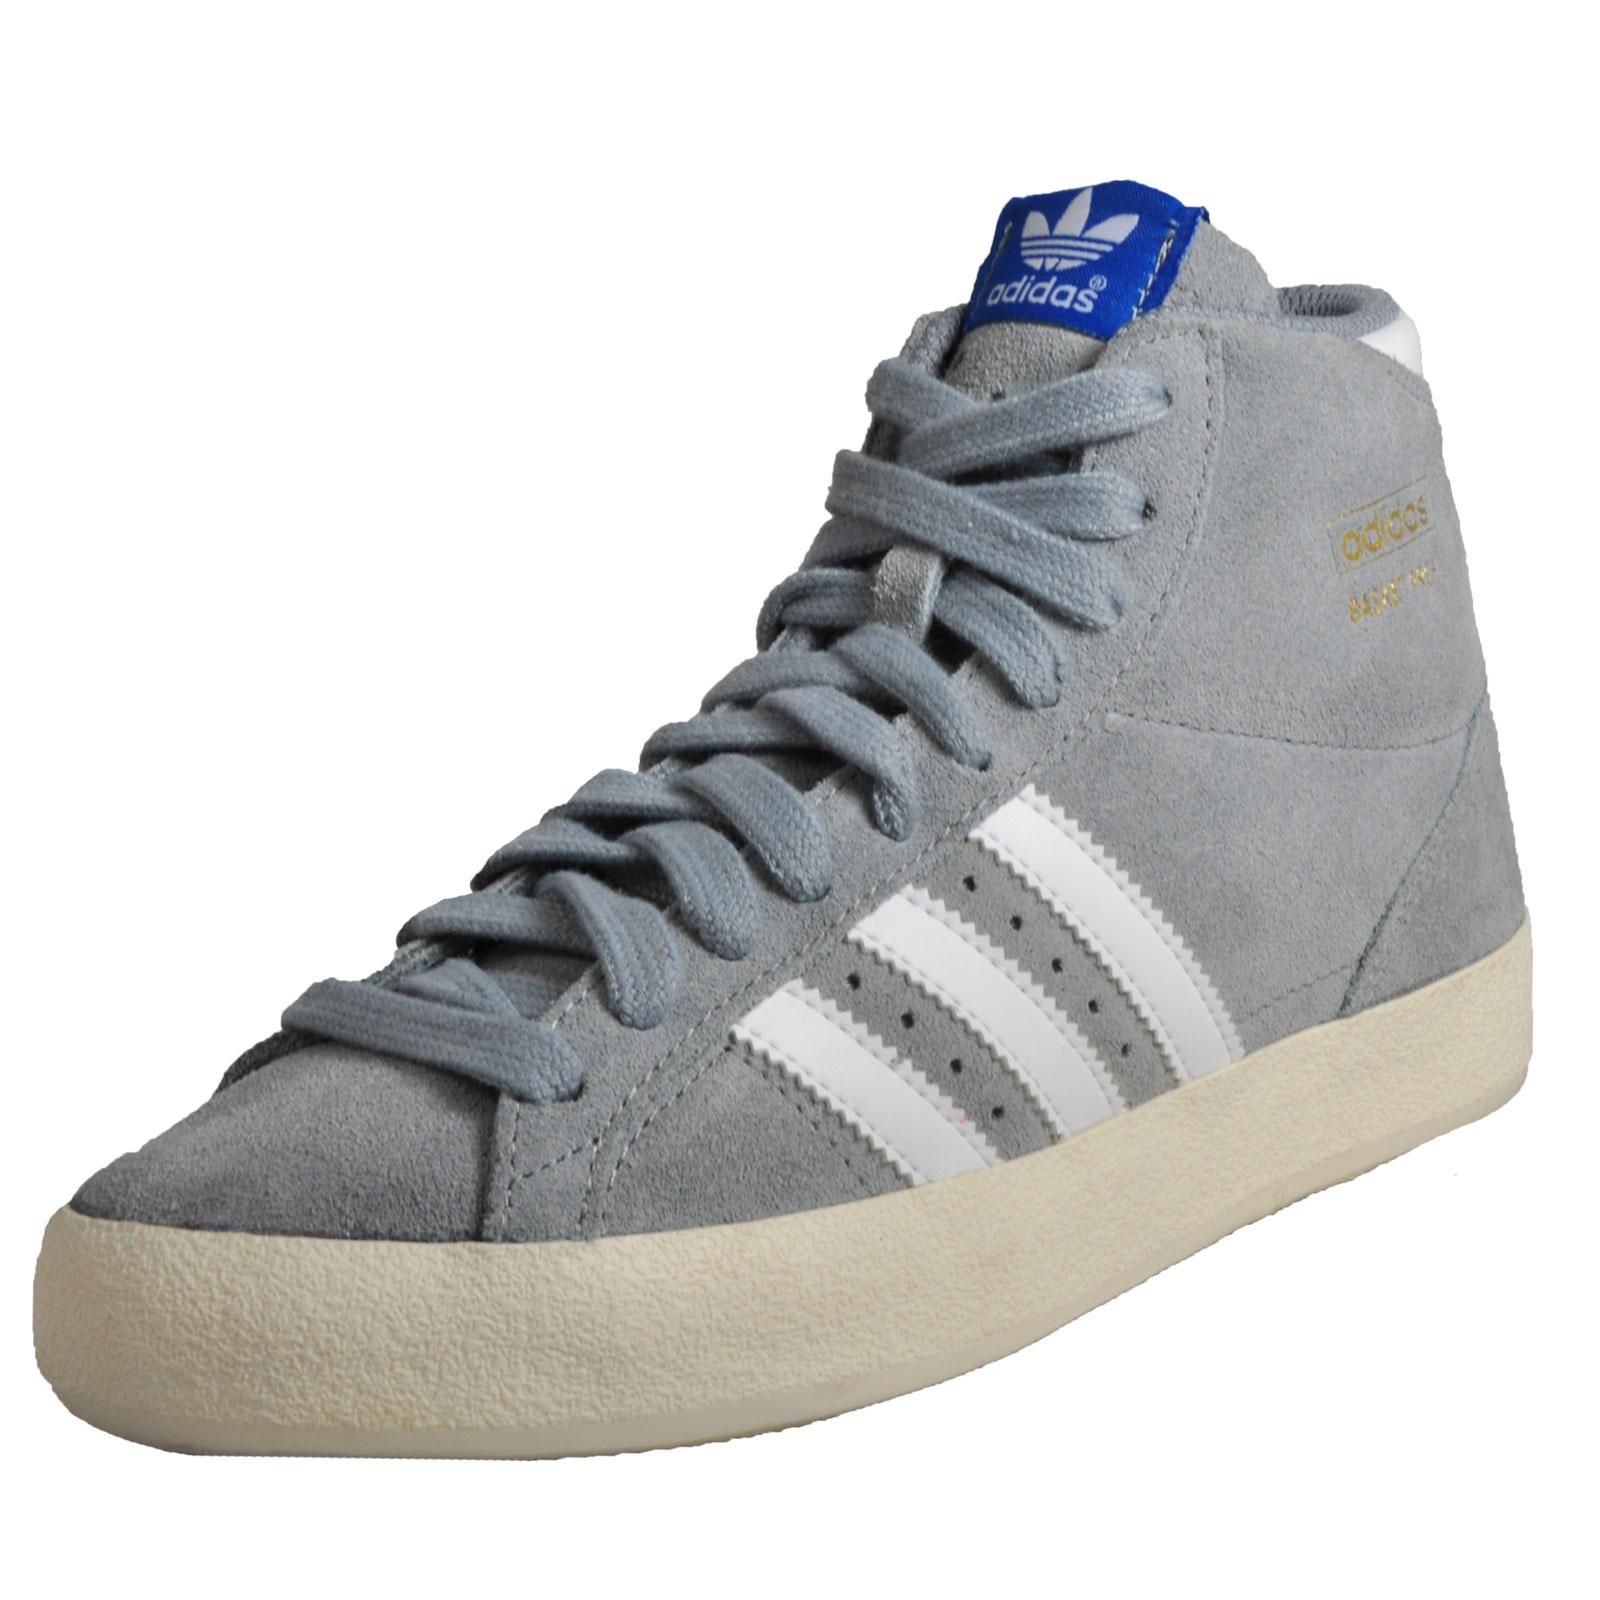 7d5c03c1d45 Details about Adidas Originals Basket Profi Hi Uni Classic Basketball Retro  Trainers Grey B Gr